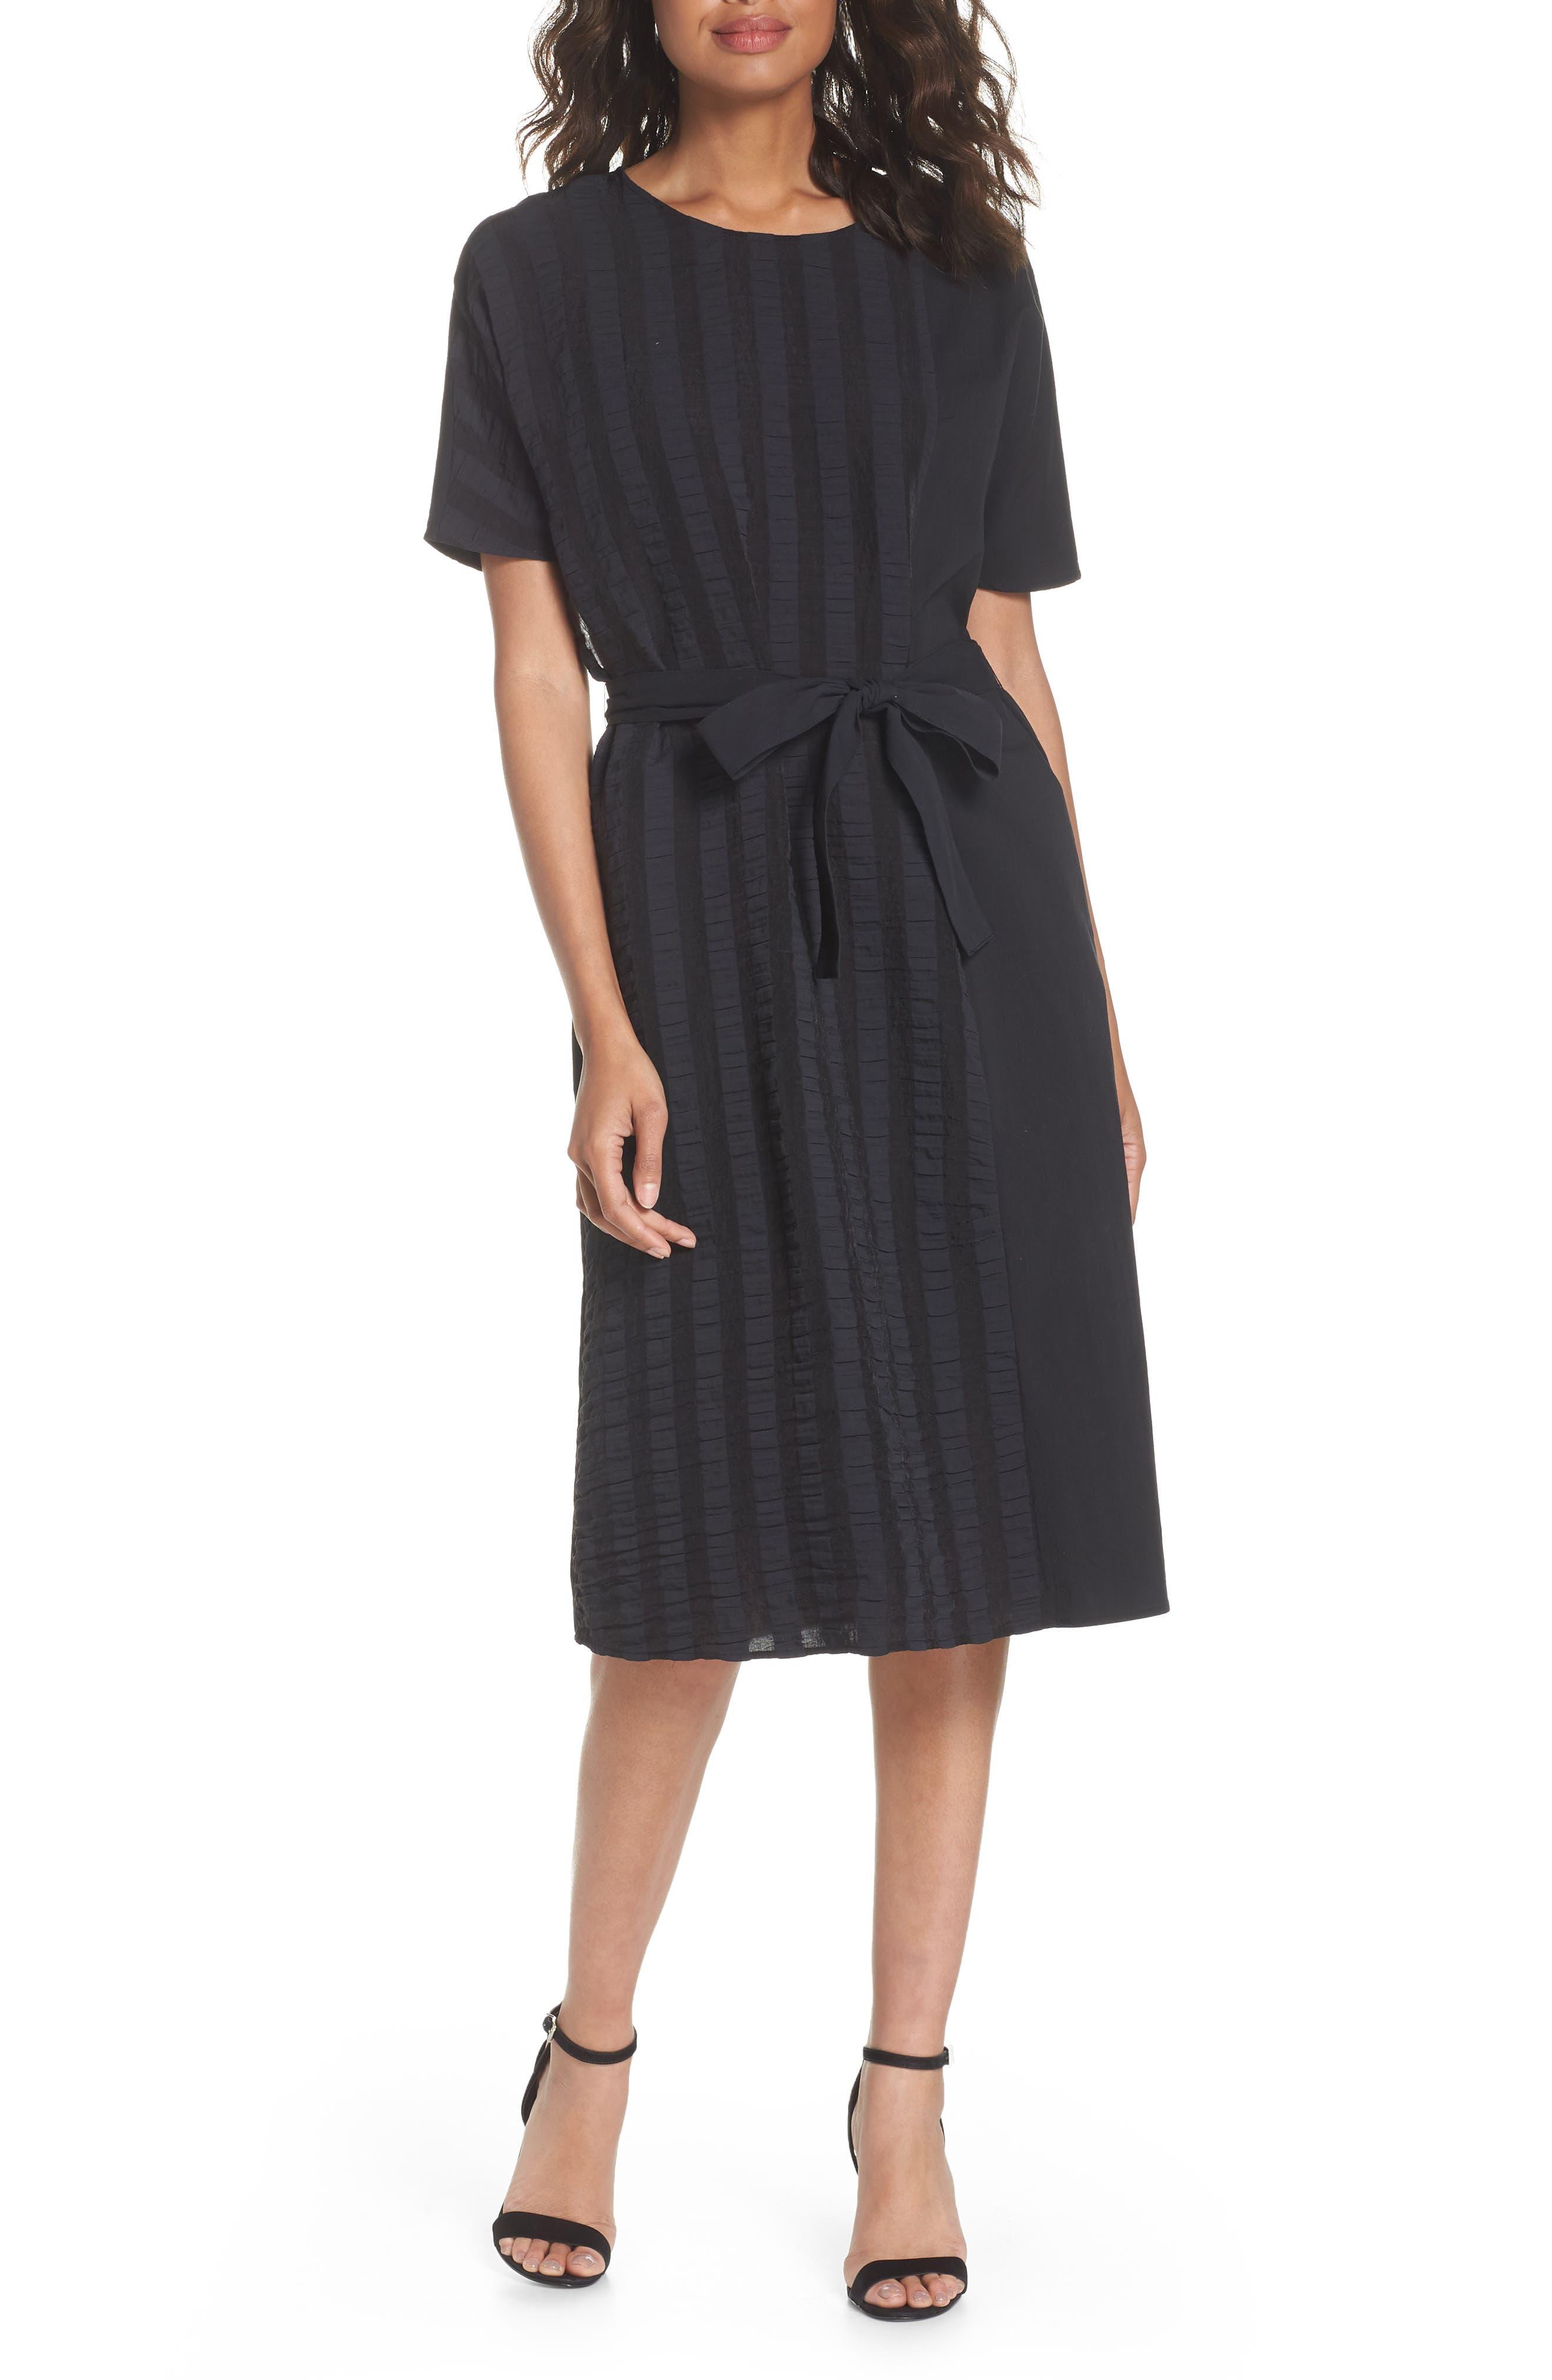 Throwing Shade Midi Dress,                         Main,                         color, Black